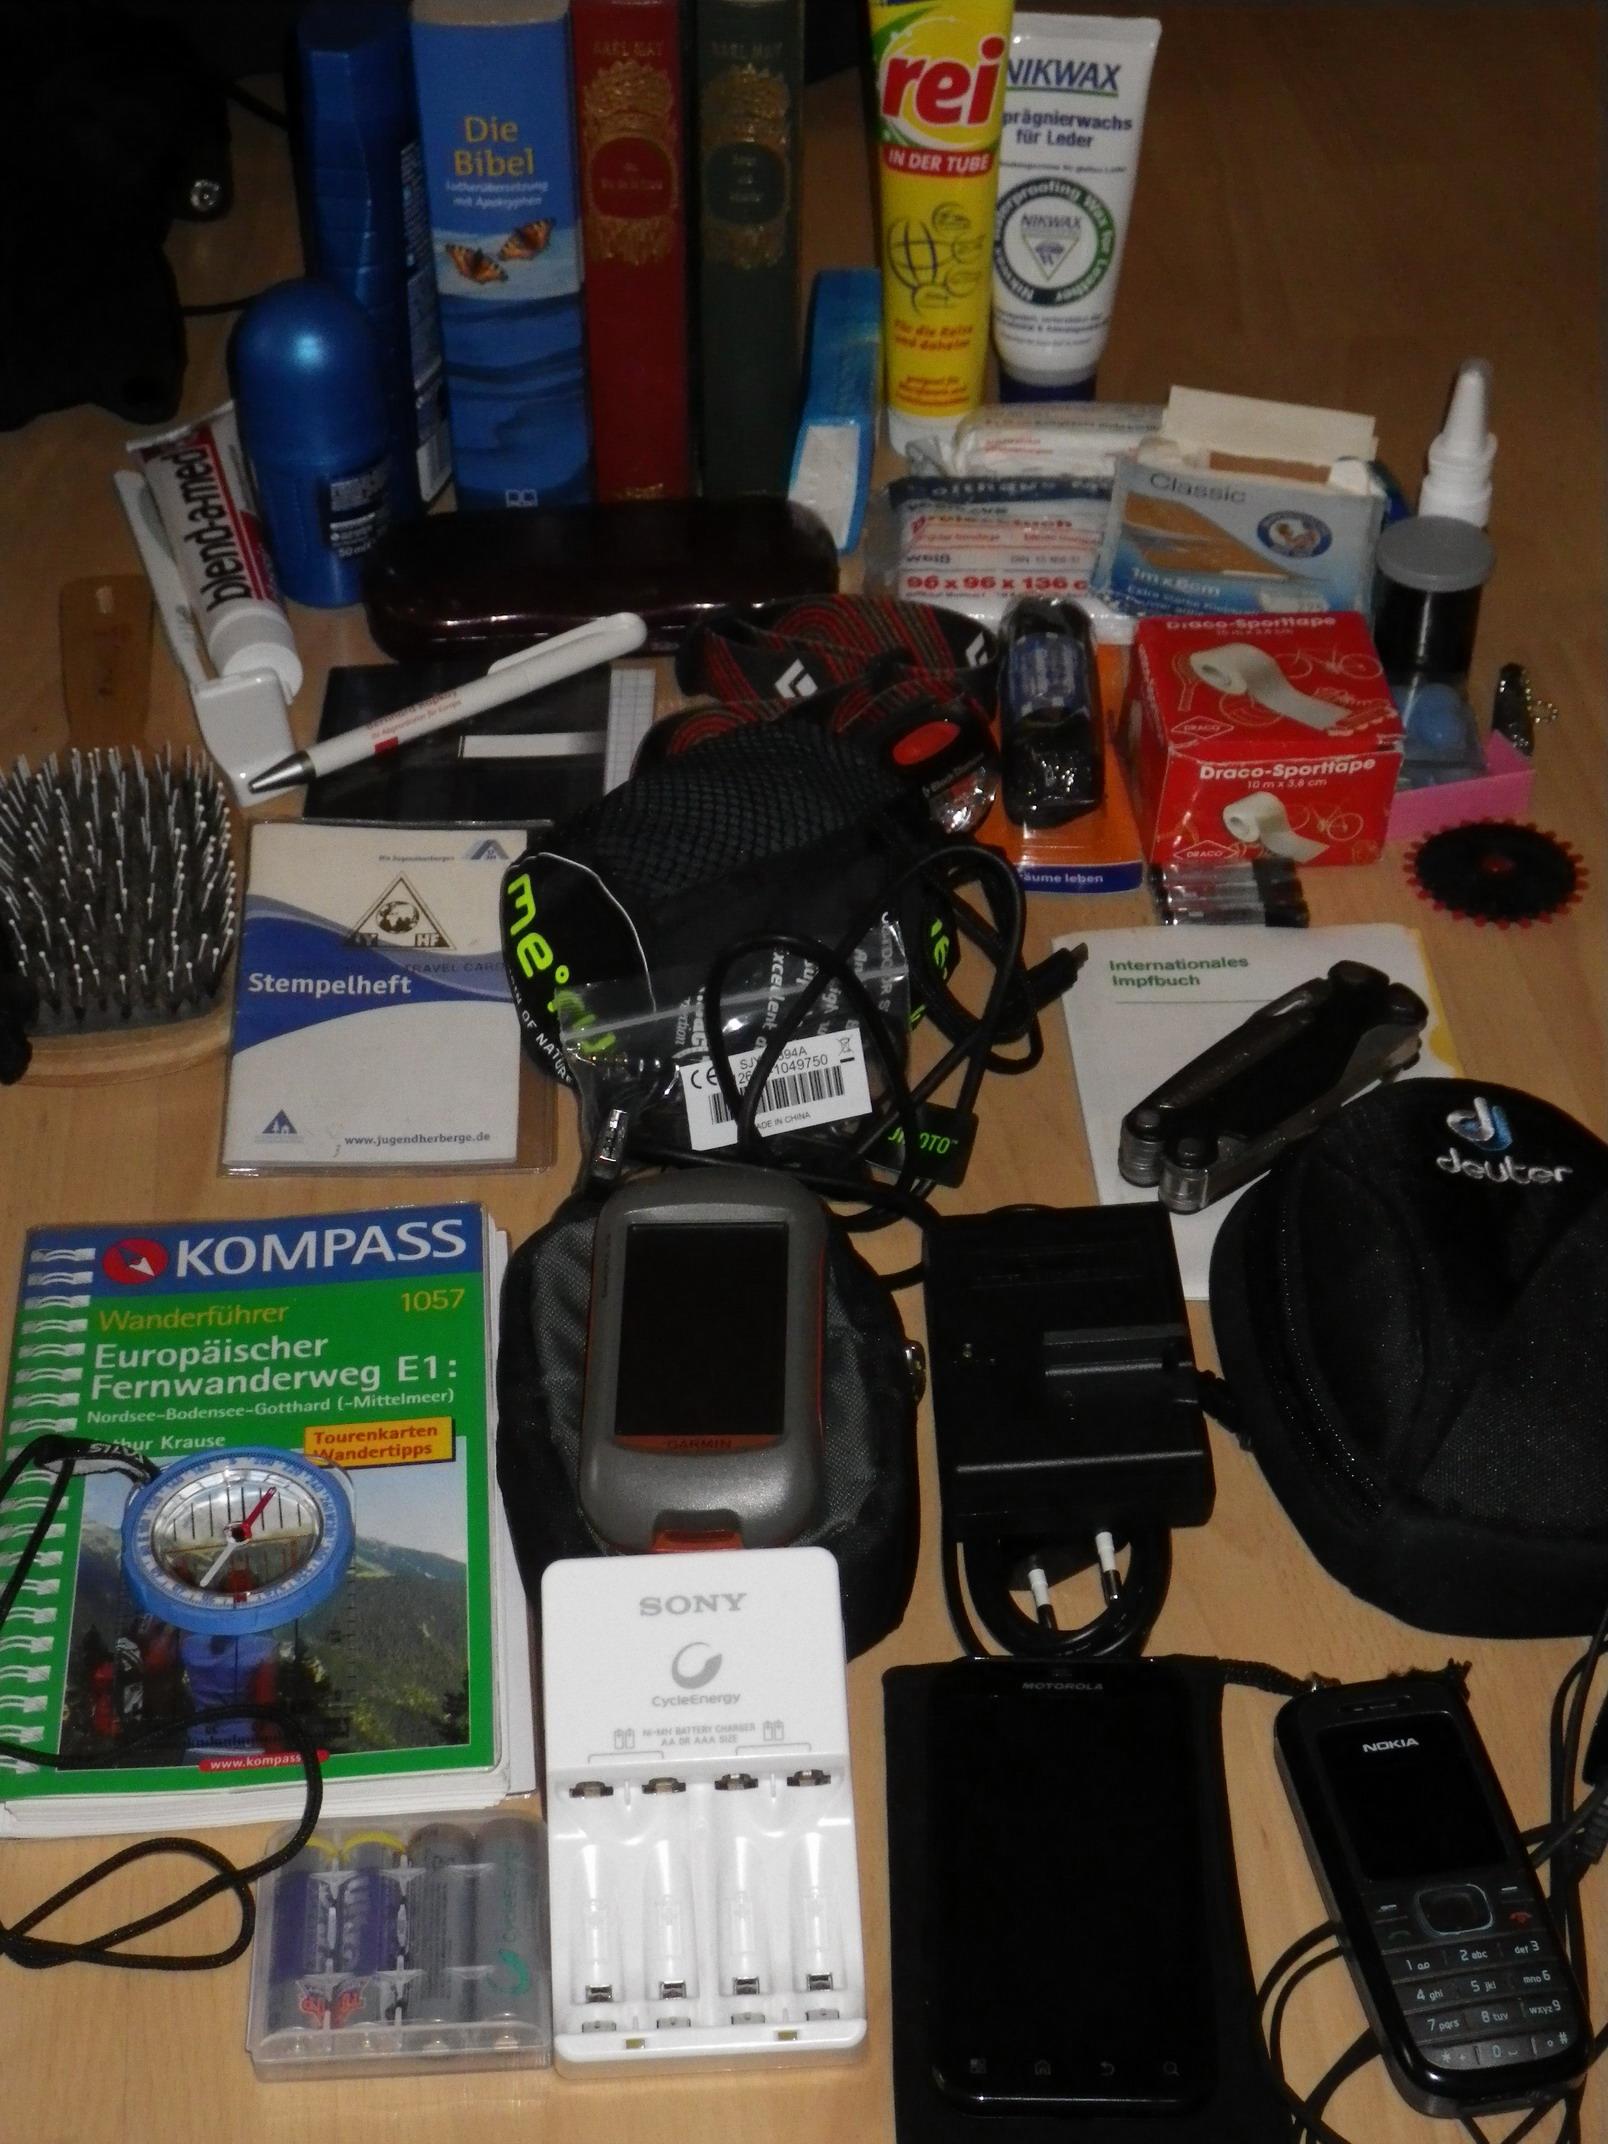 Elektronik, Hygiene, Bücher, Werkzeuge,...